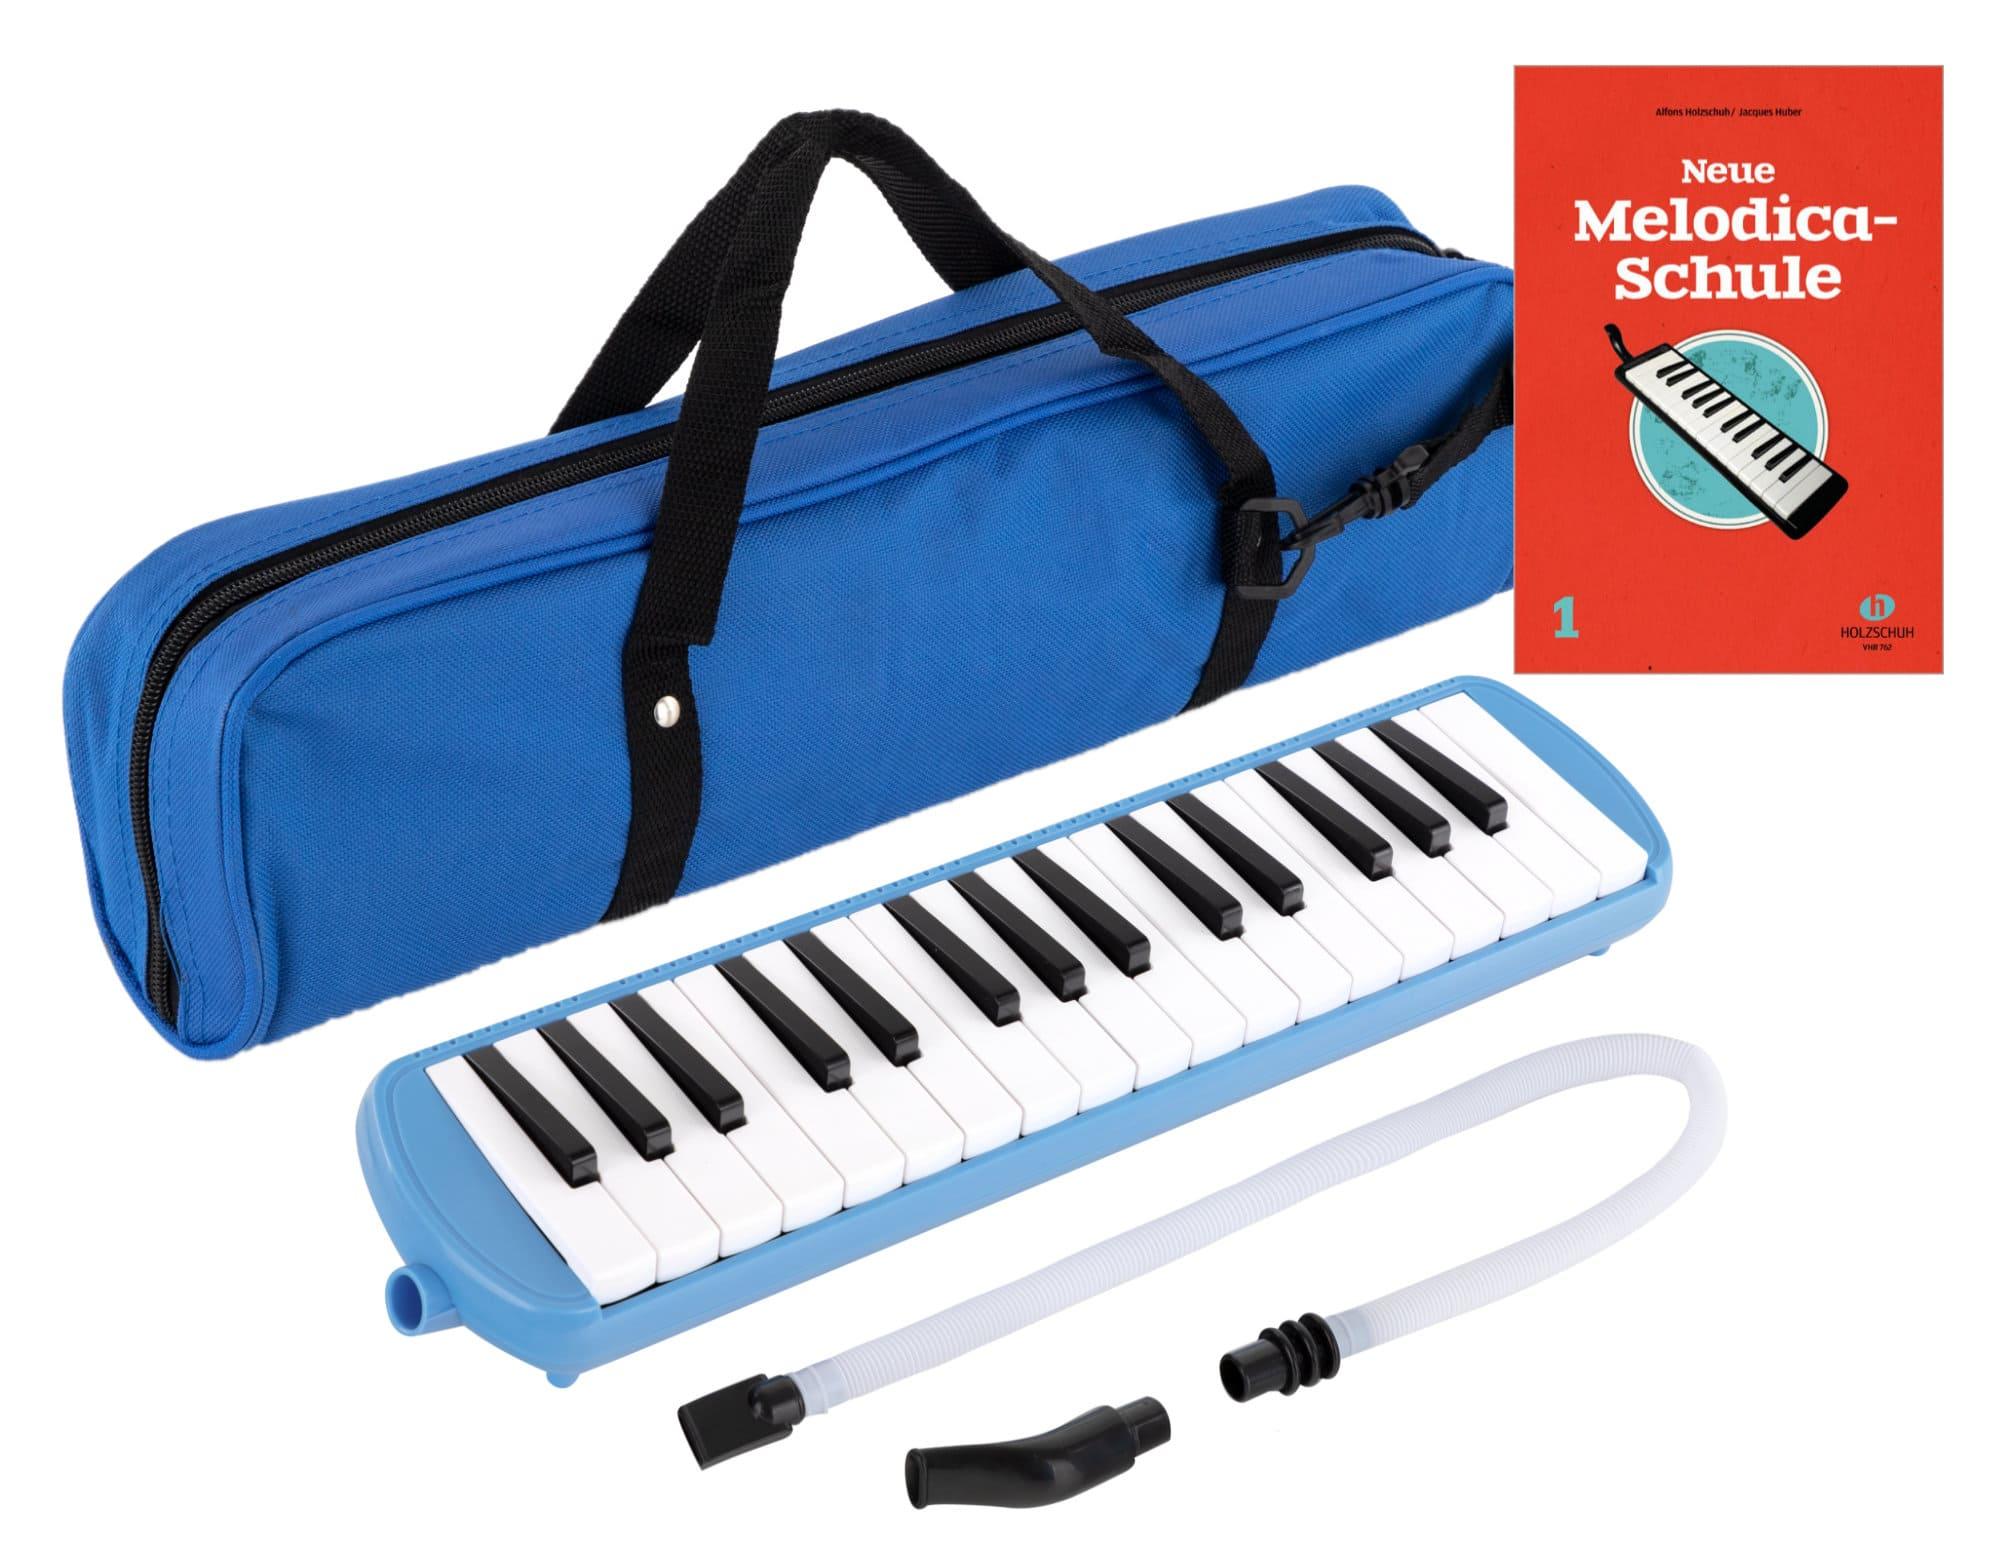 Classic Cantabile Melodica, inkl. Tasche und Buch